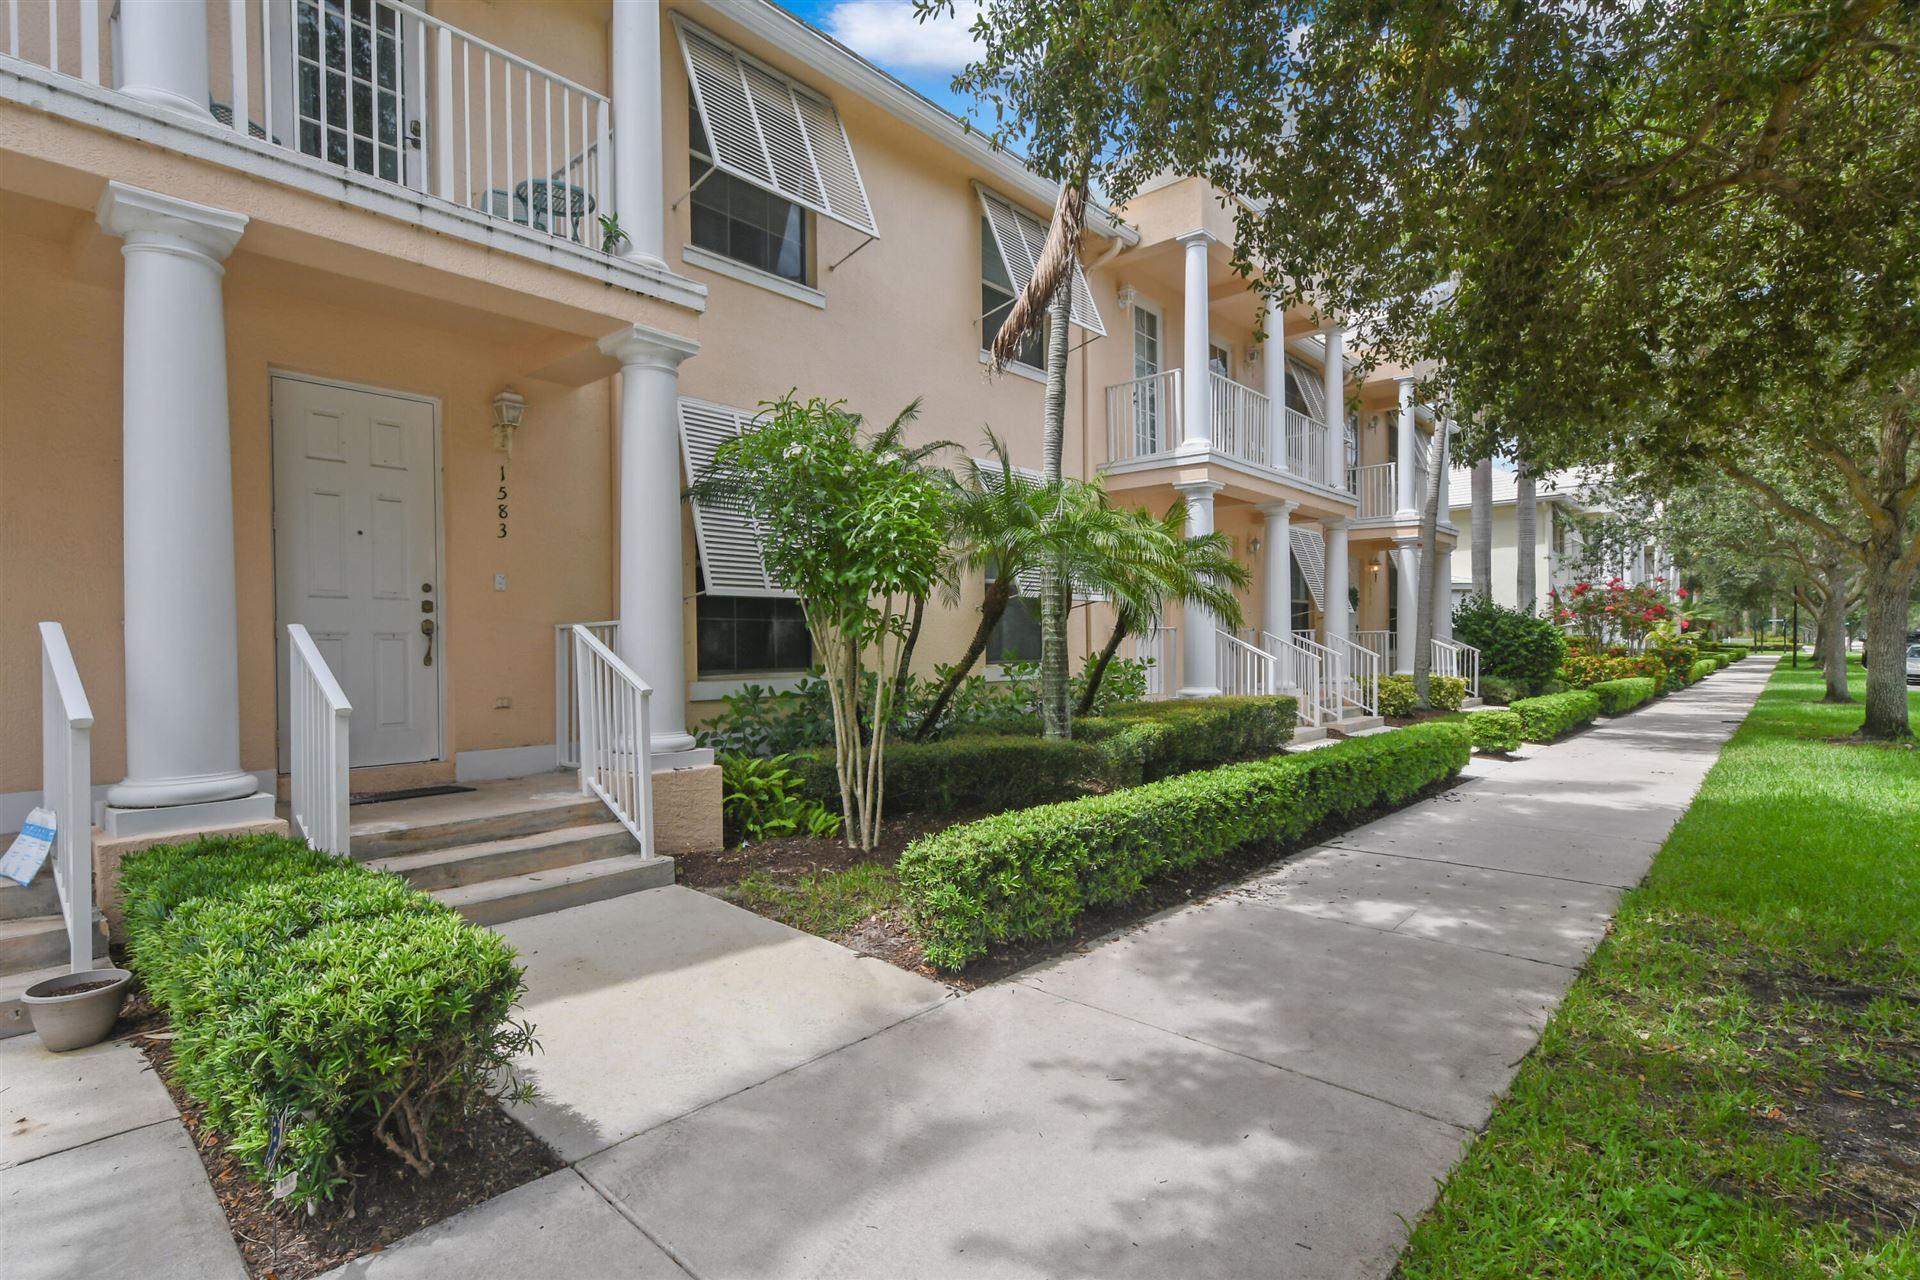 Photo of 1583 Frederick Small Road, Jupiter, FL 33458 (MLS # RX-10728406)